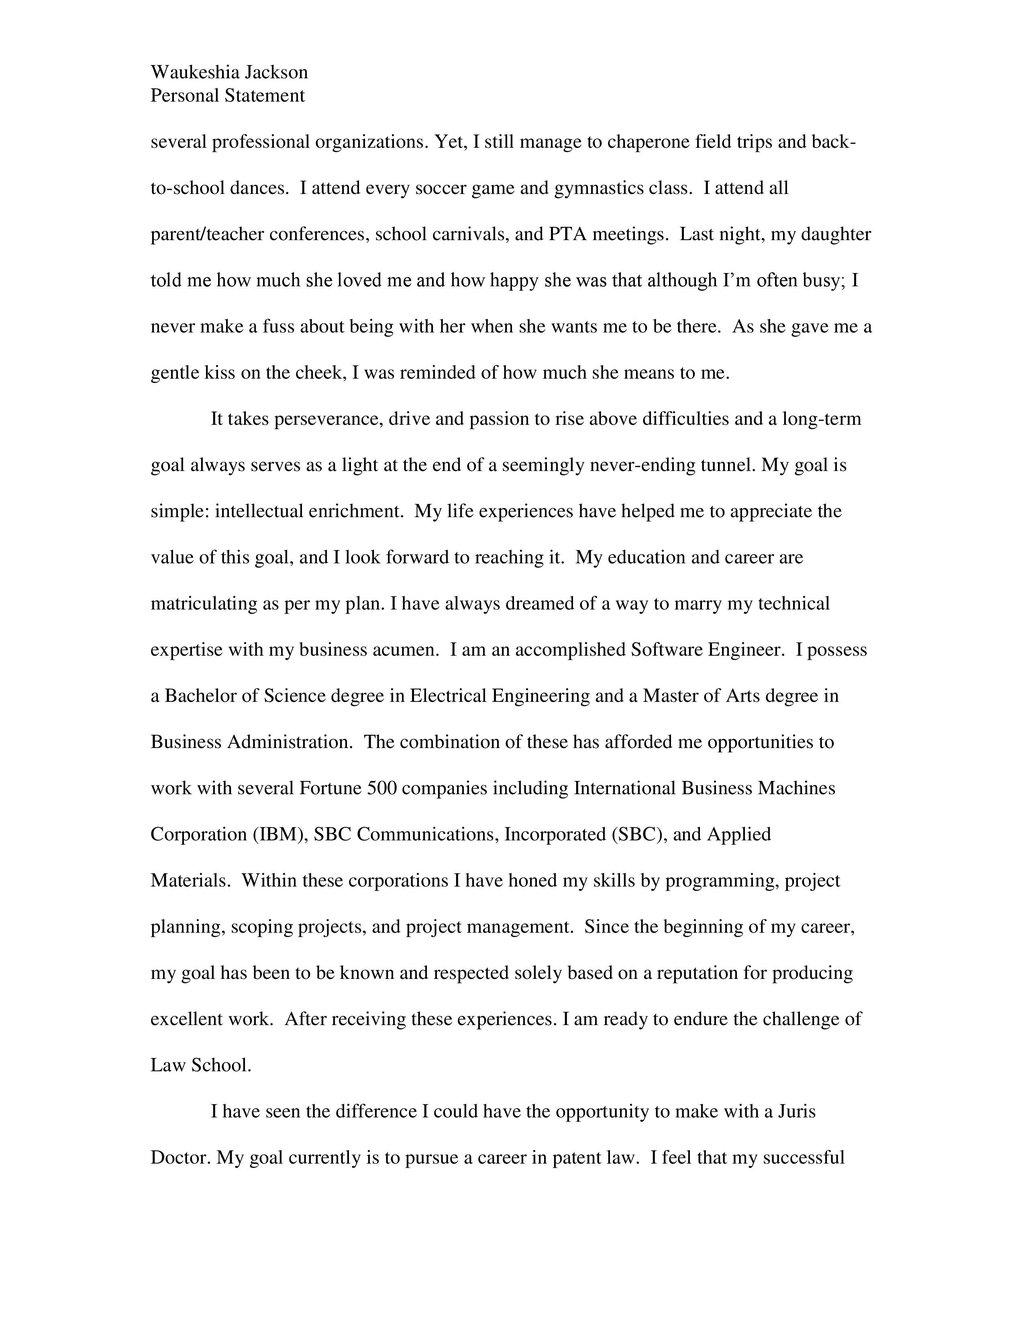 2 Law School Personal Statements That Succeeded Top Law Schools